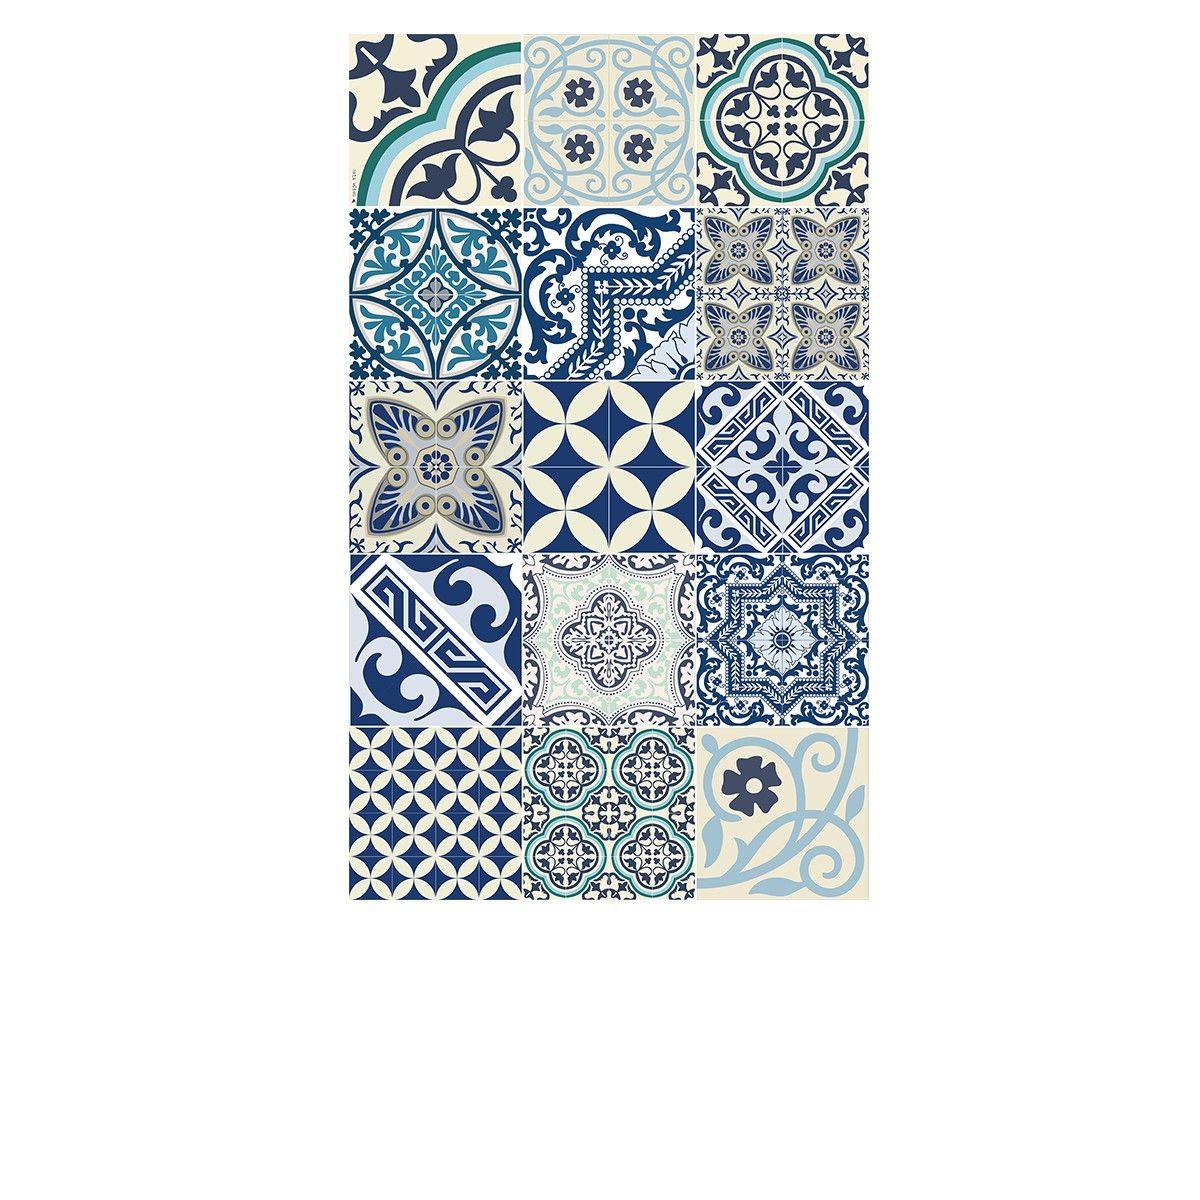 Tapis Vinyle Eclectic Bleu Blanc 60 X 97 Cm Beija Flor